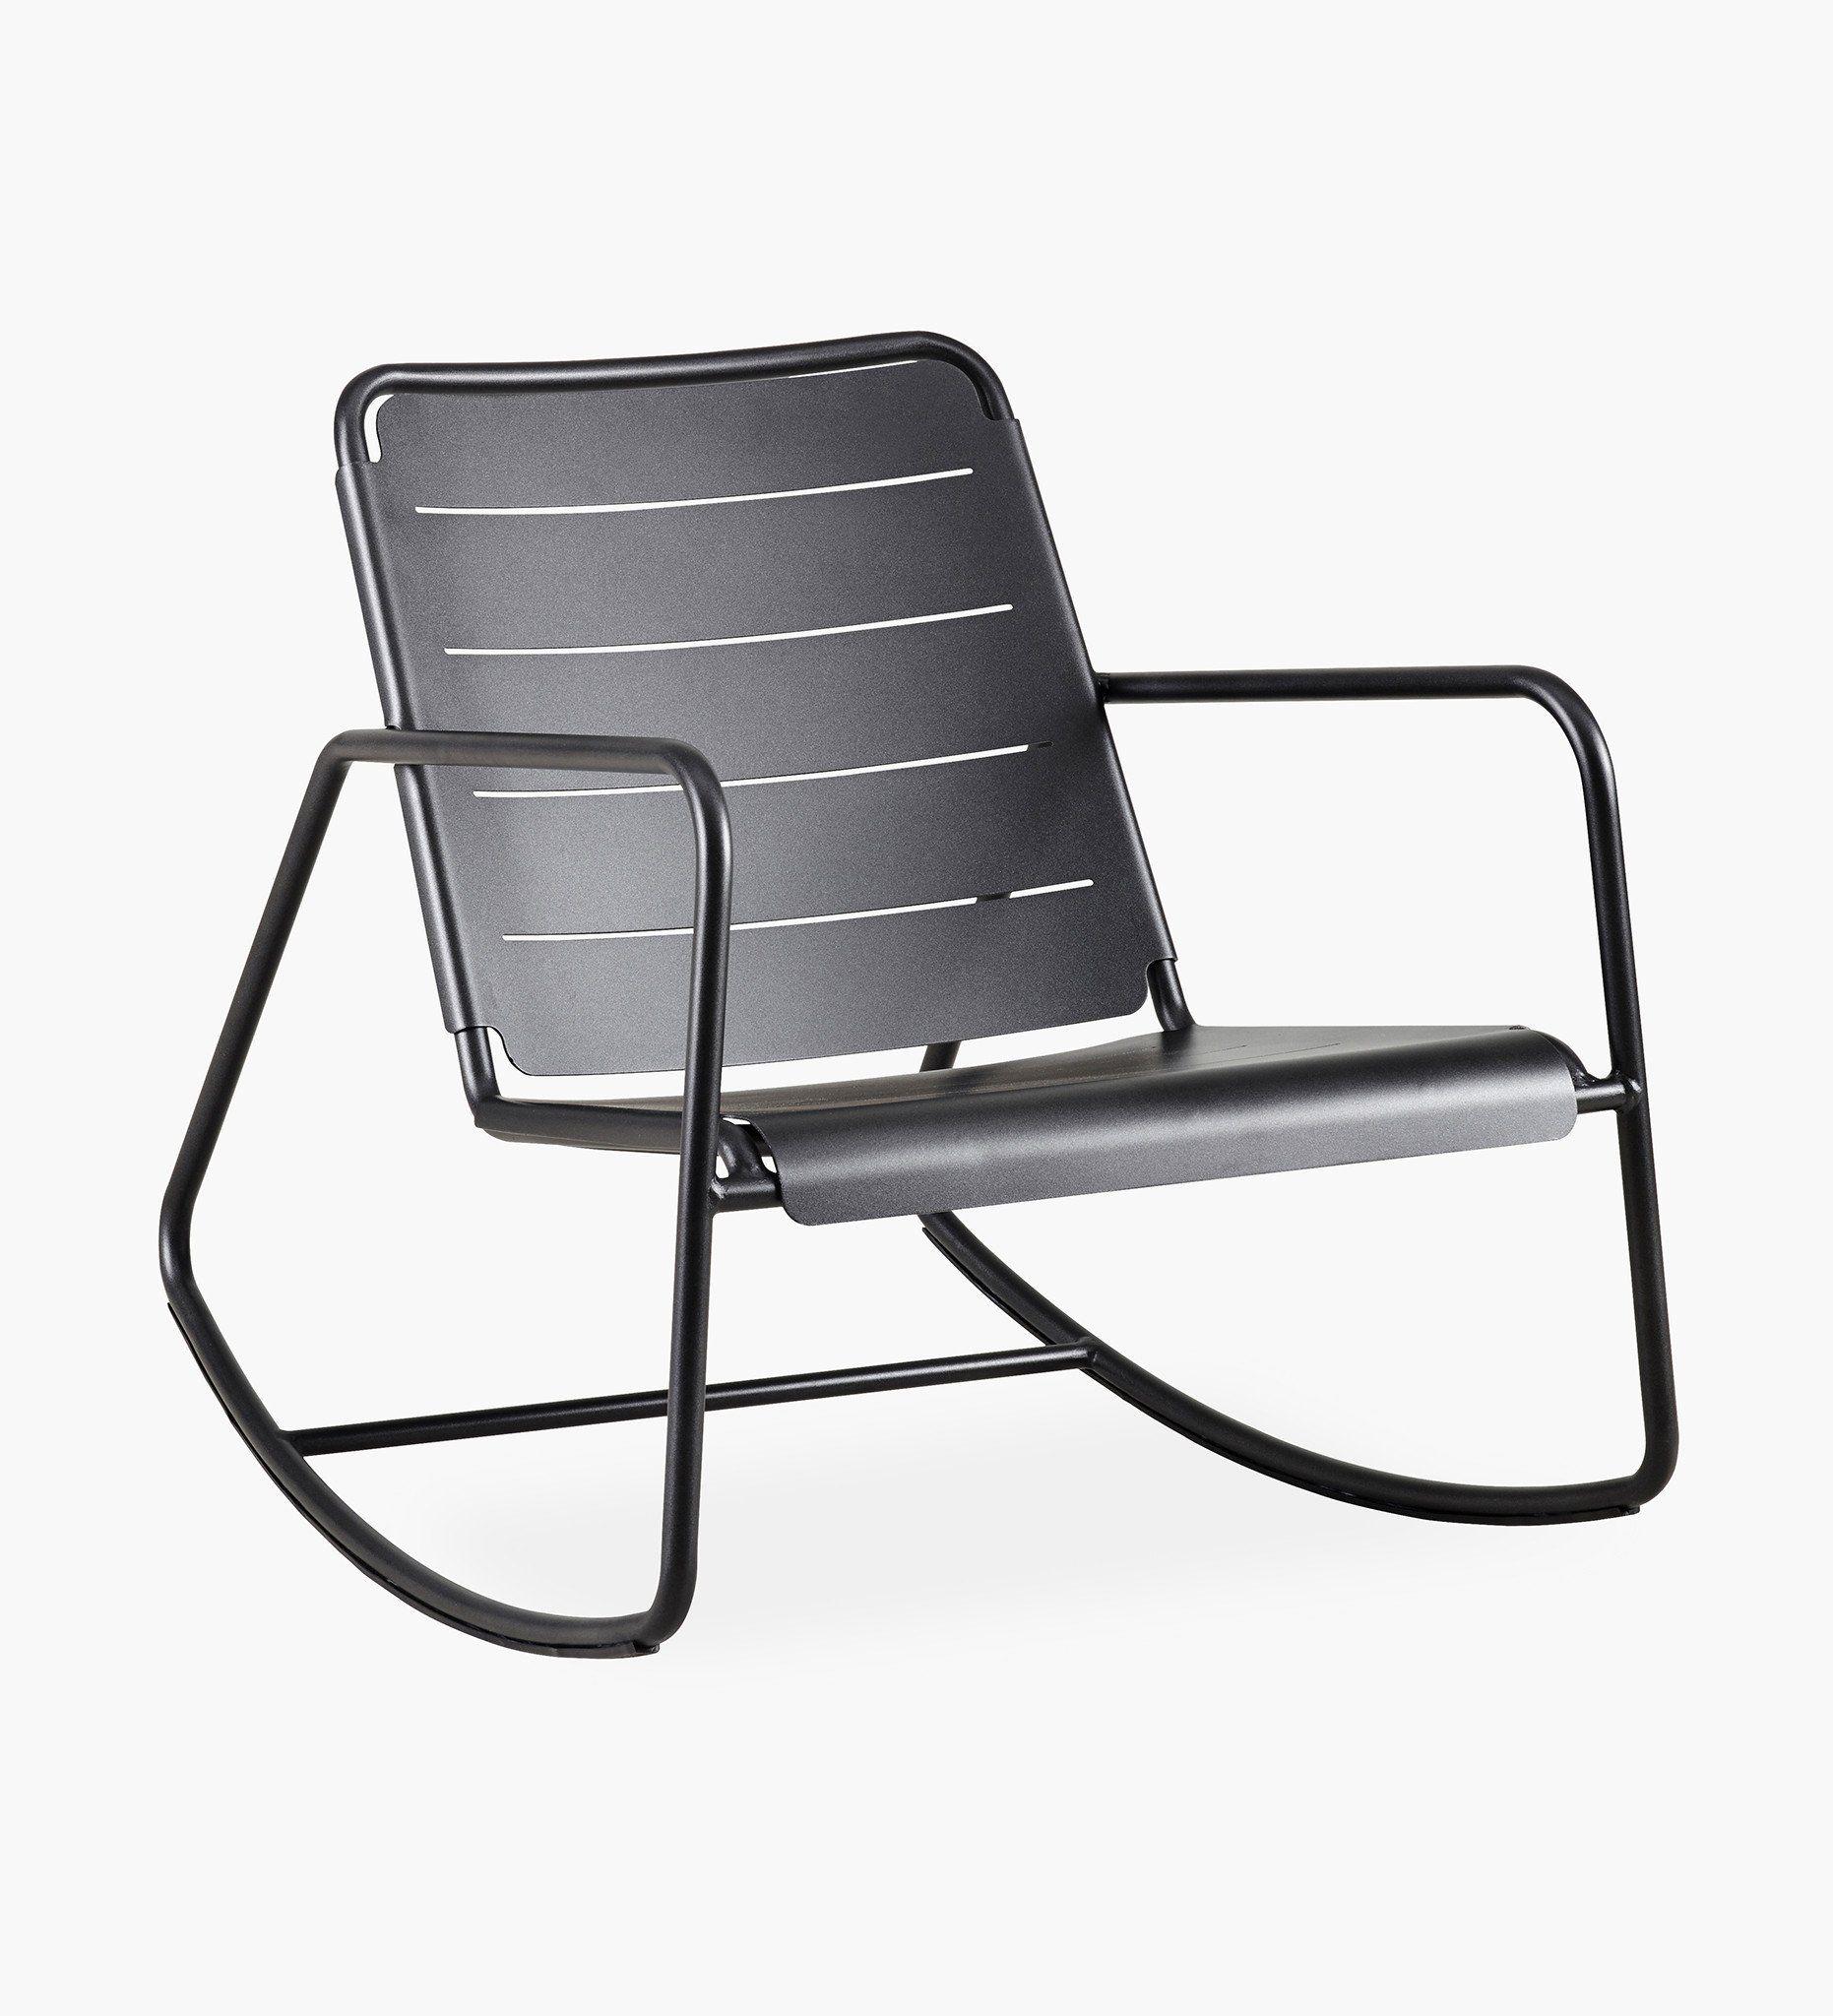 Copenhagen Rocking Chair Lounge chair outdoor, Garden